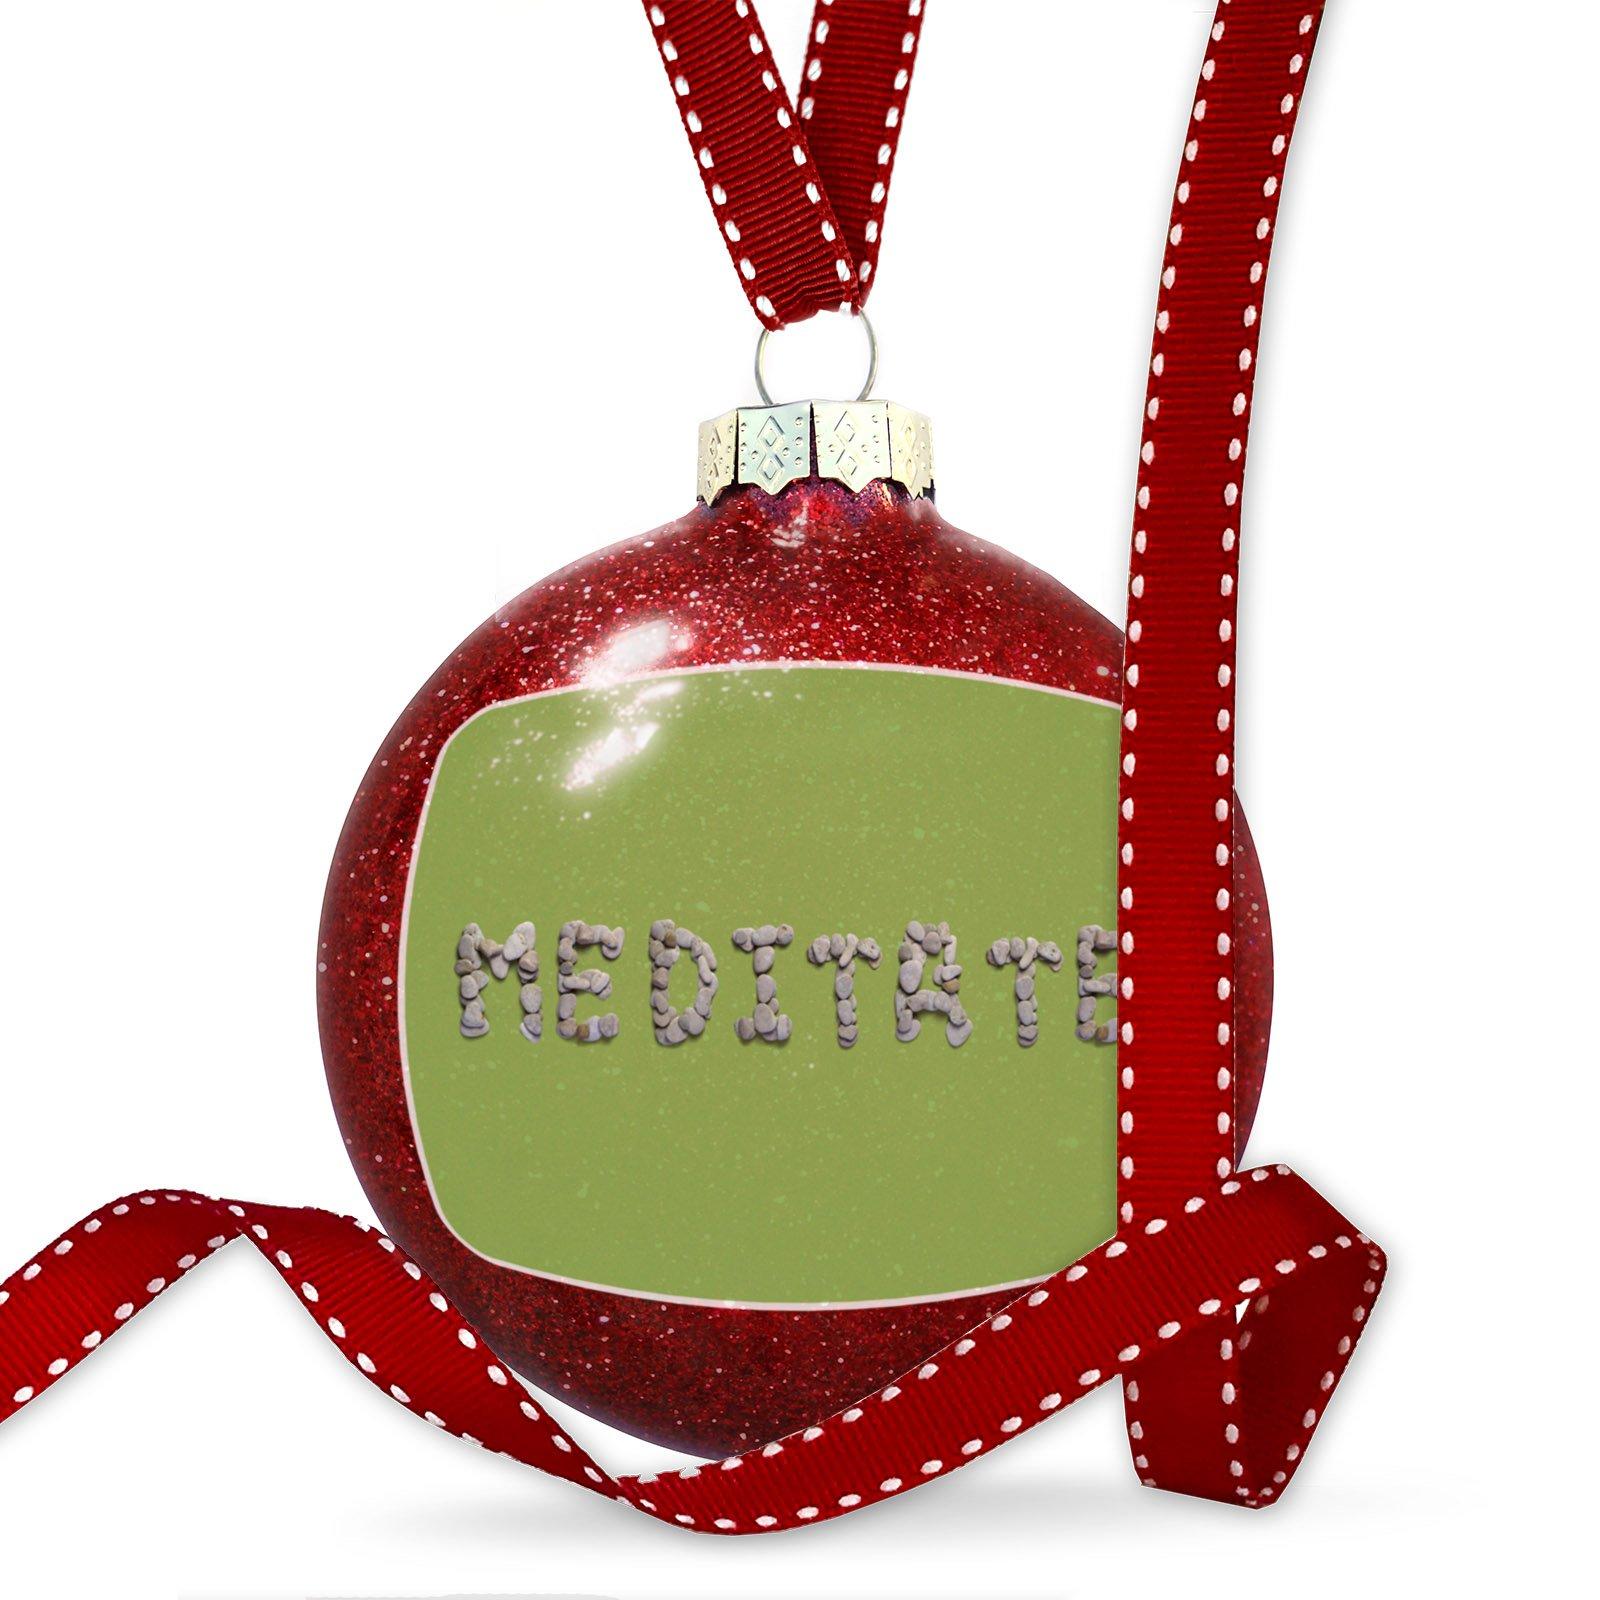 Christmas Decoration Meditate Spa Stones Rocks Ornament